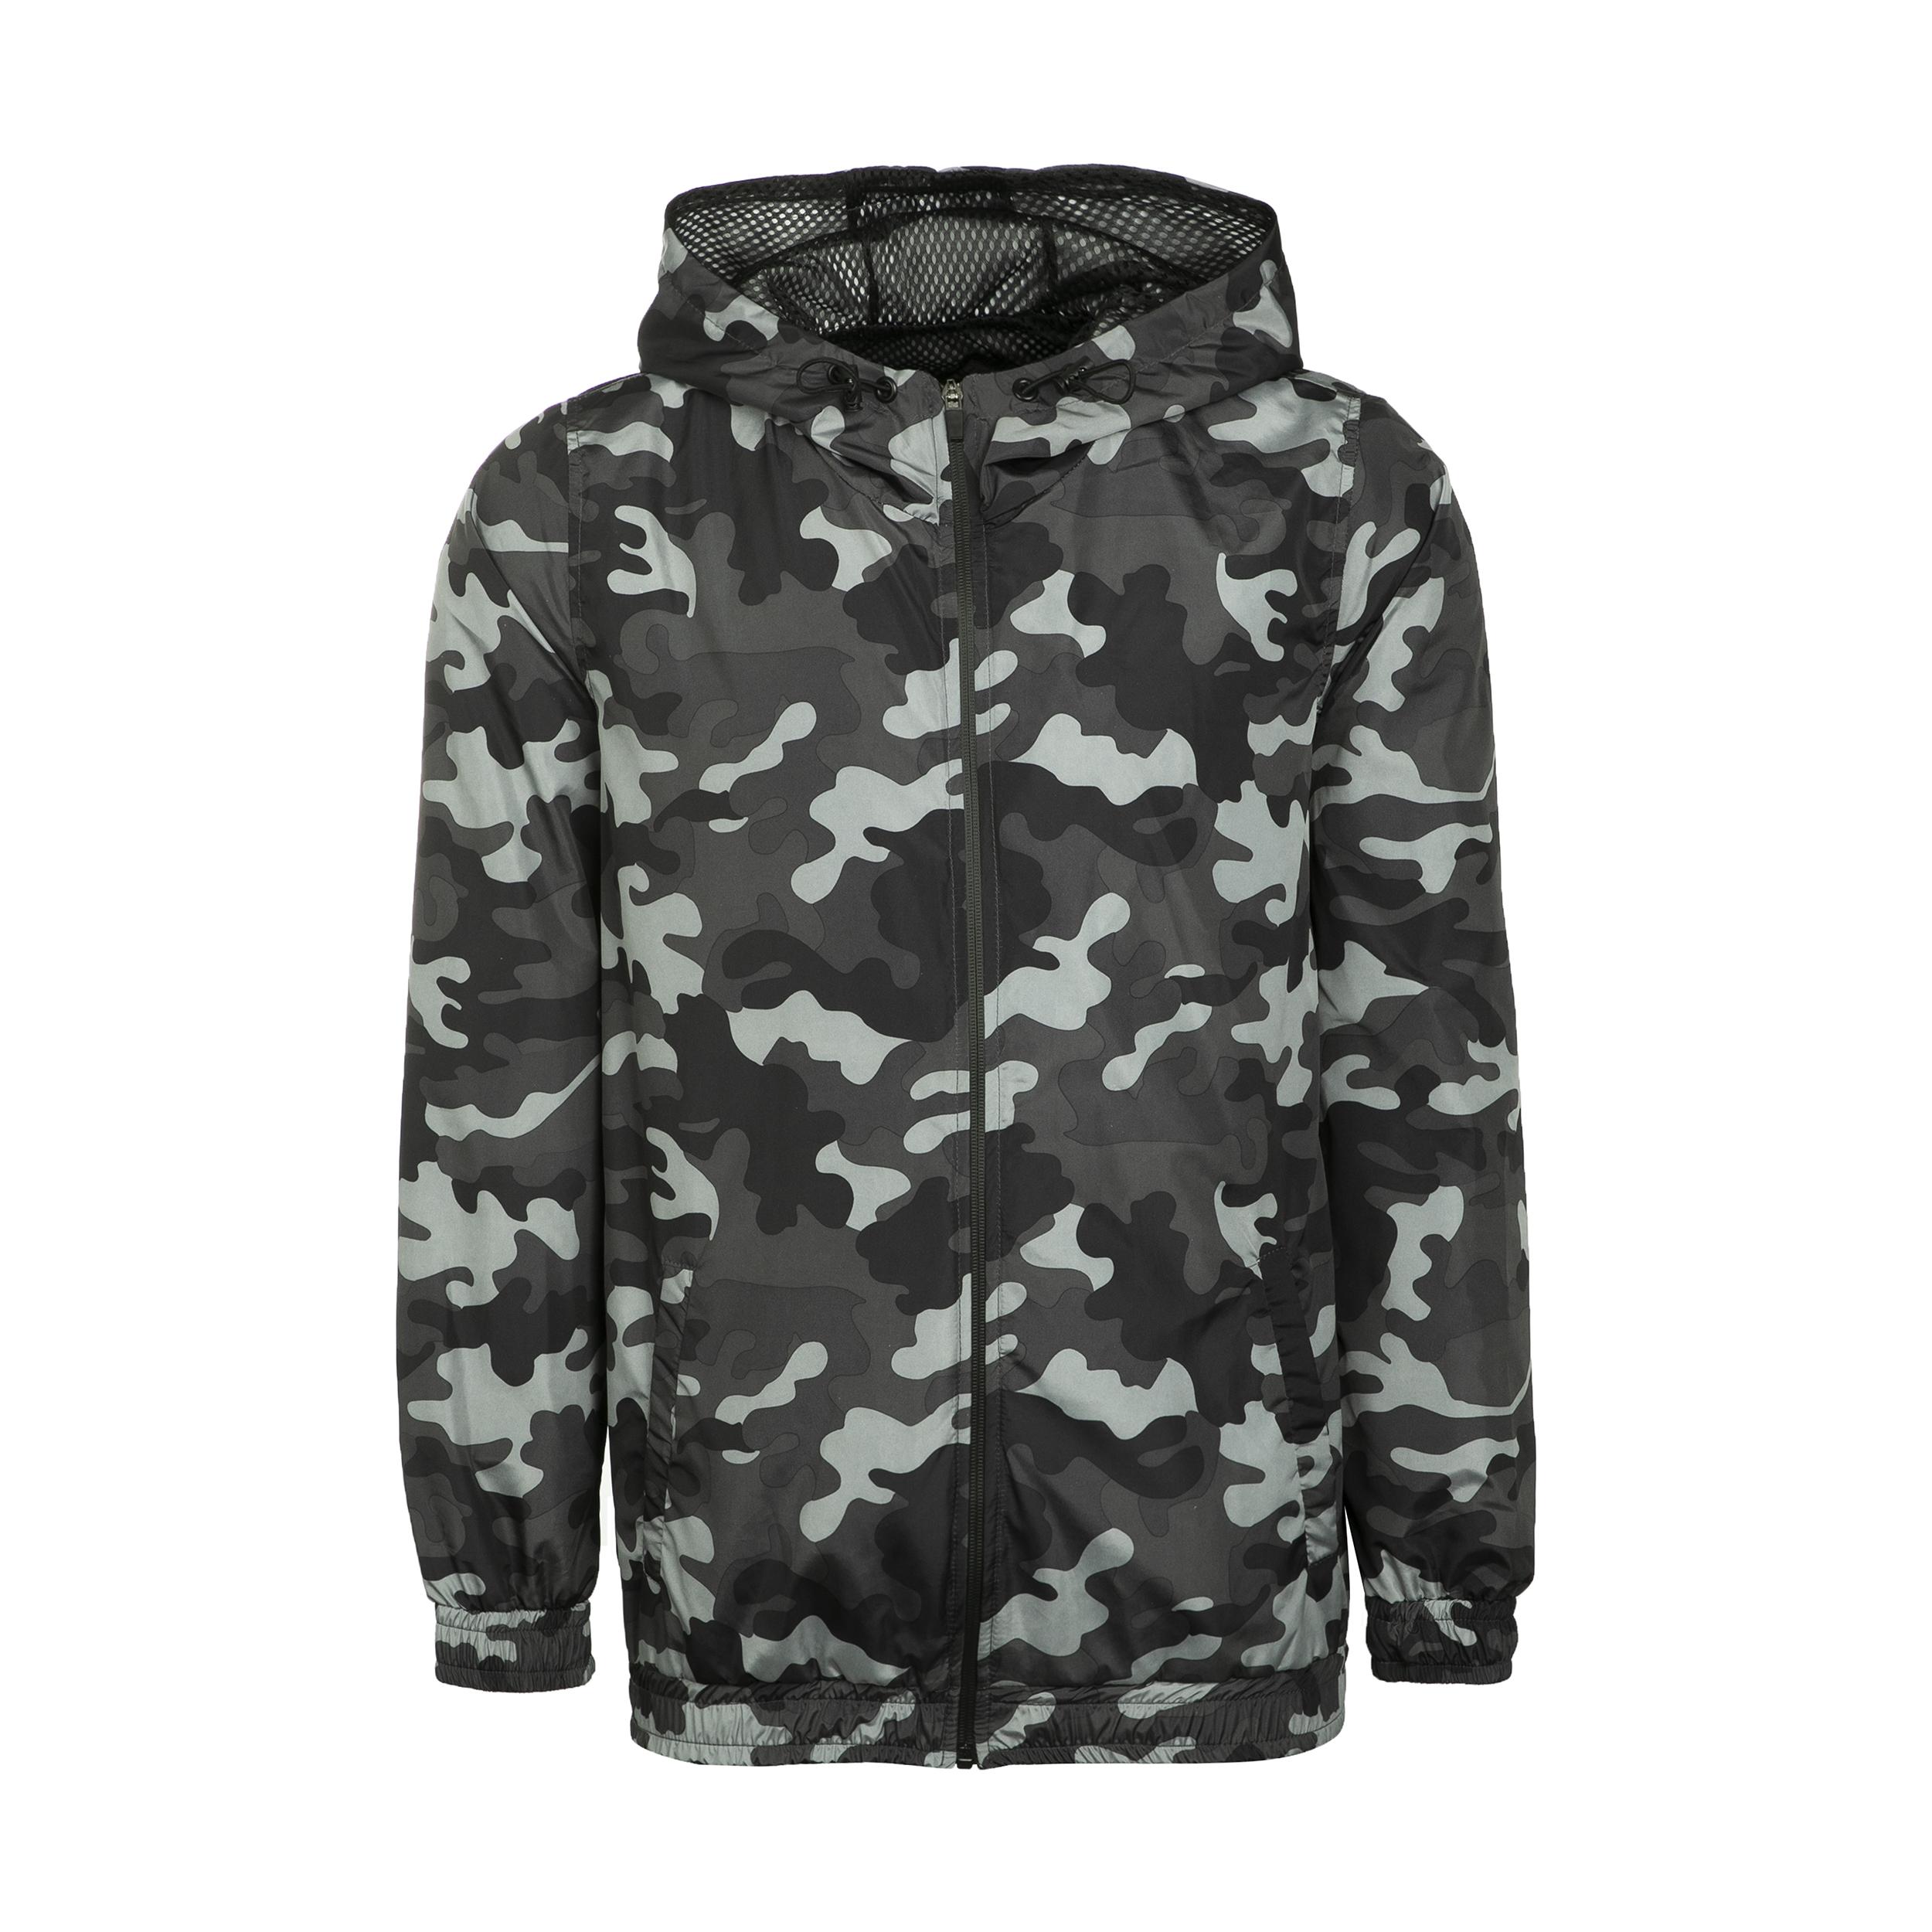 سویشرت مردانه جامه پوش آرا مدل 4101289100-99